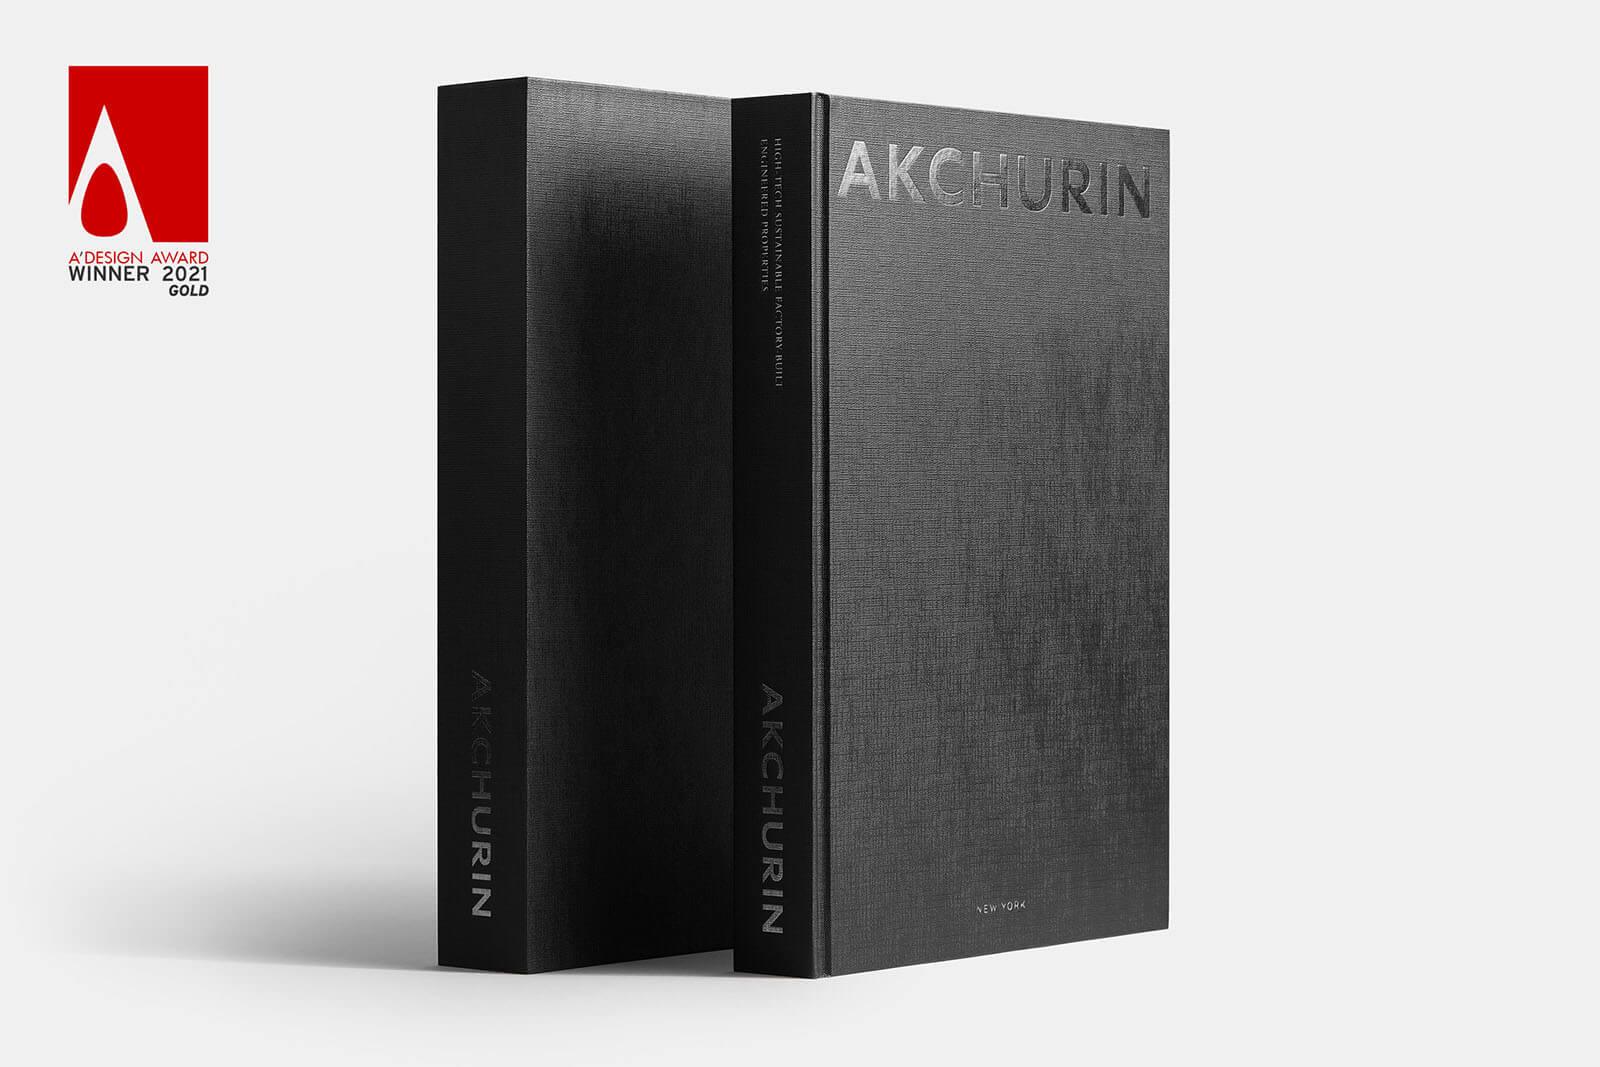 akchurin book 01 red